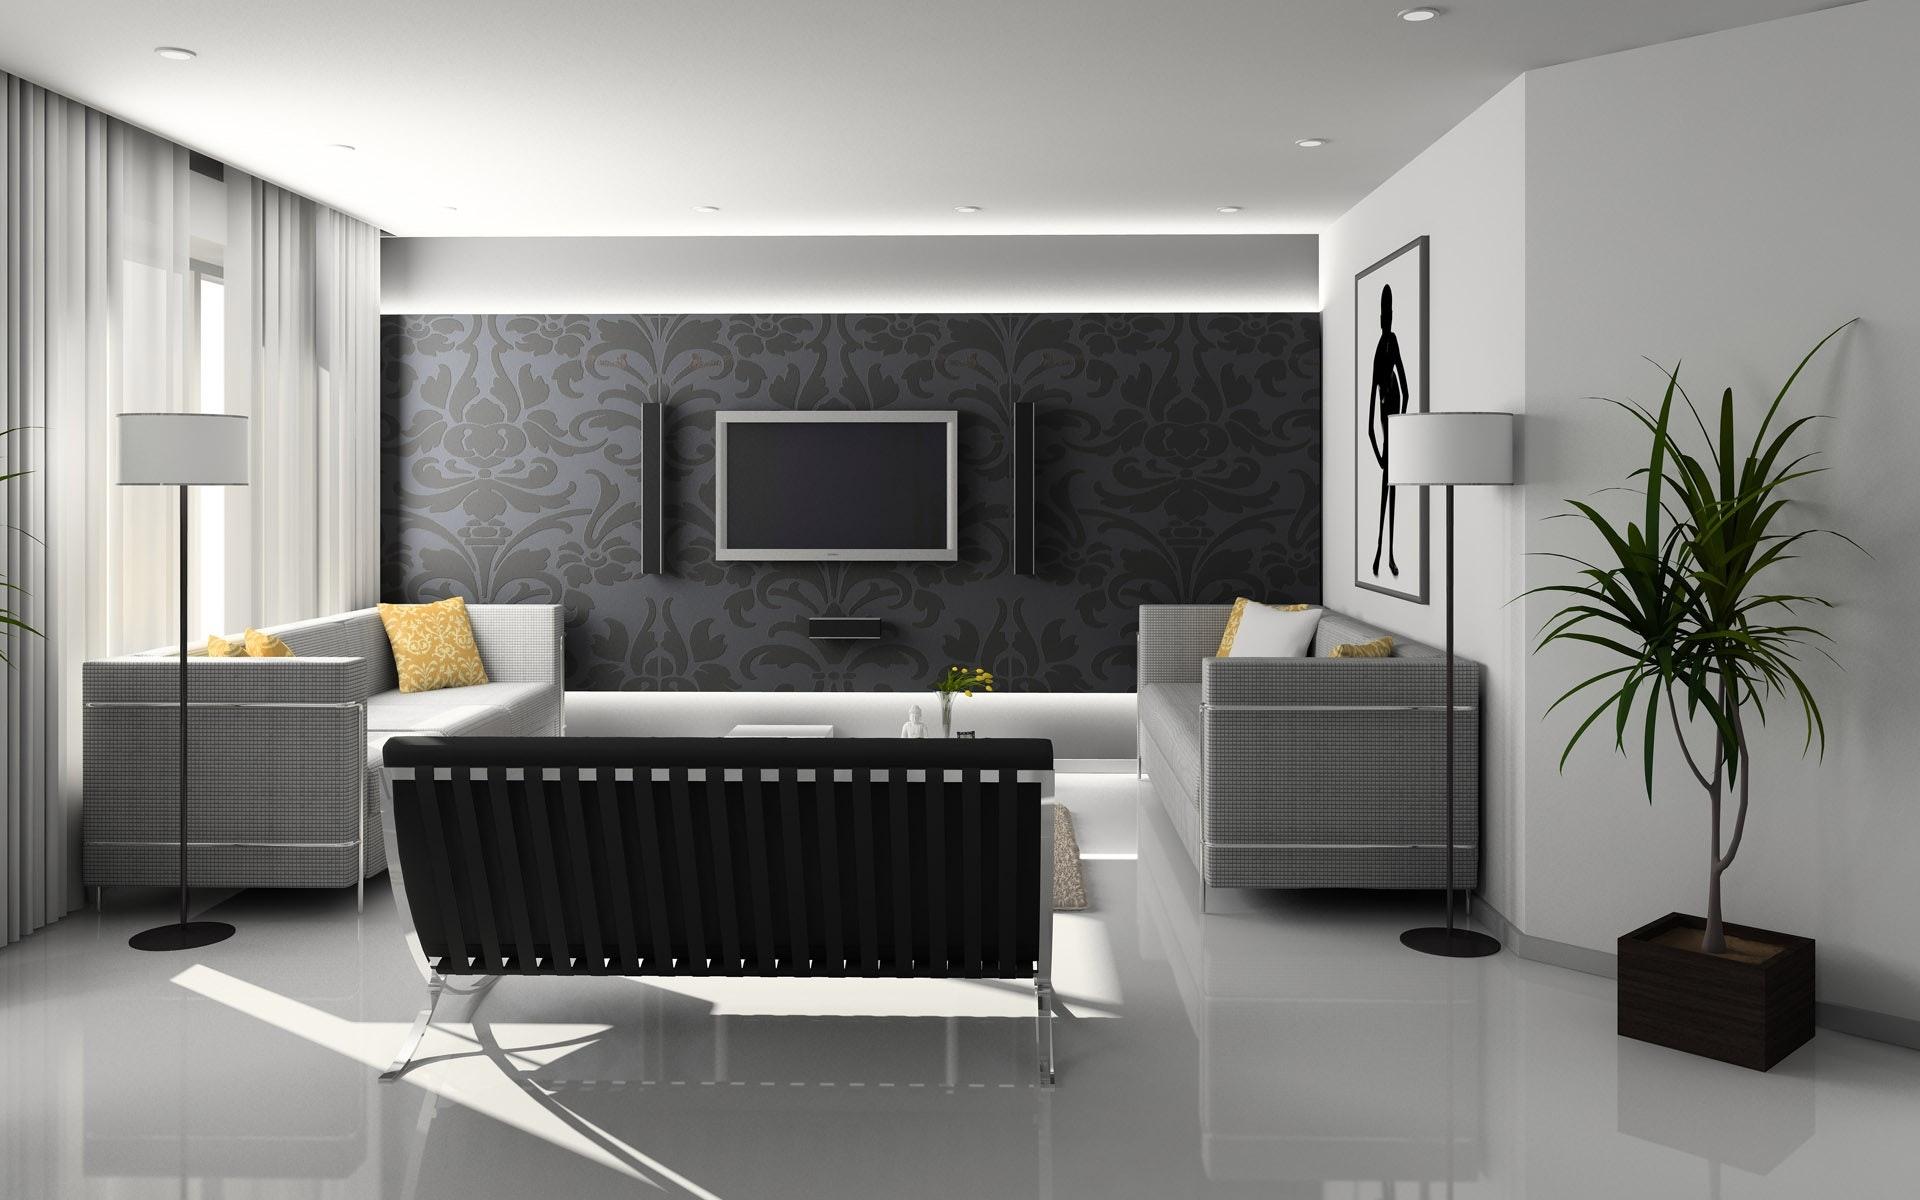 Brianne, Brianne Butler, striking dwelling, home decor, home. couch, furniture, design, stunning, beautiful, table, best table, luxury home, luxury furniture, luxury home interior.